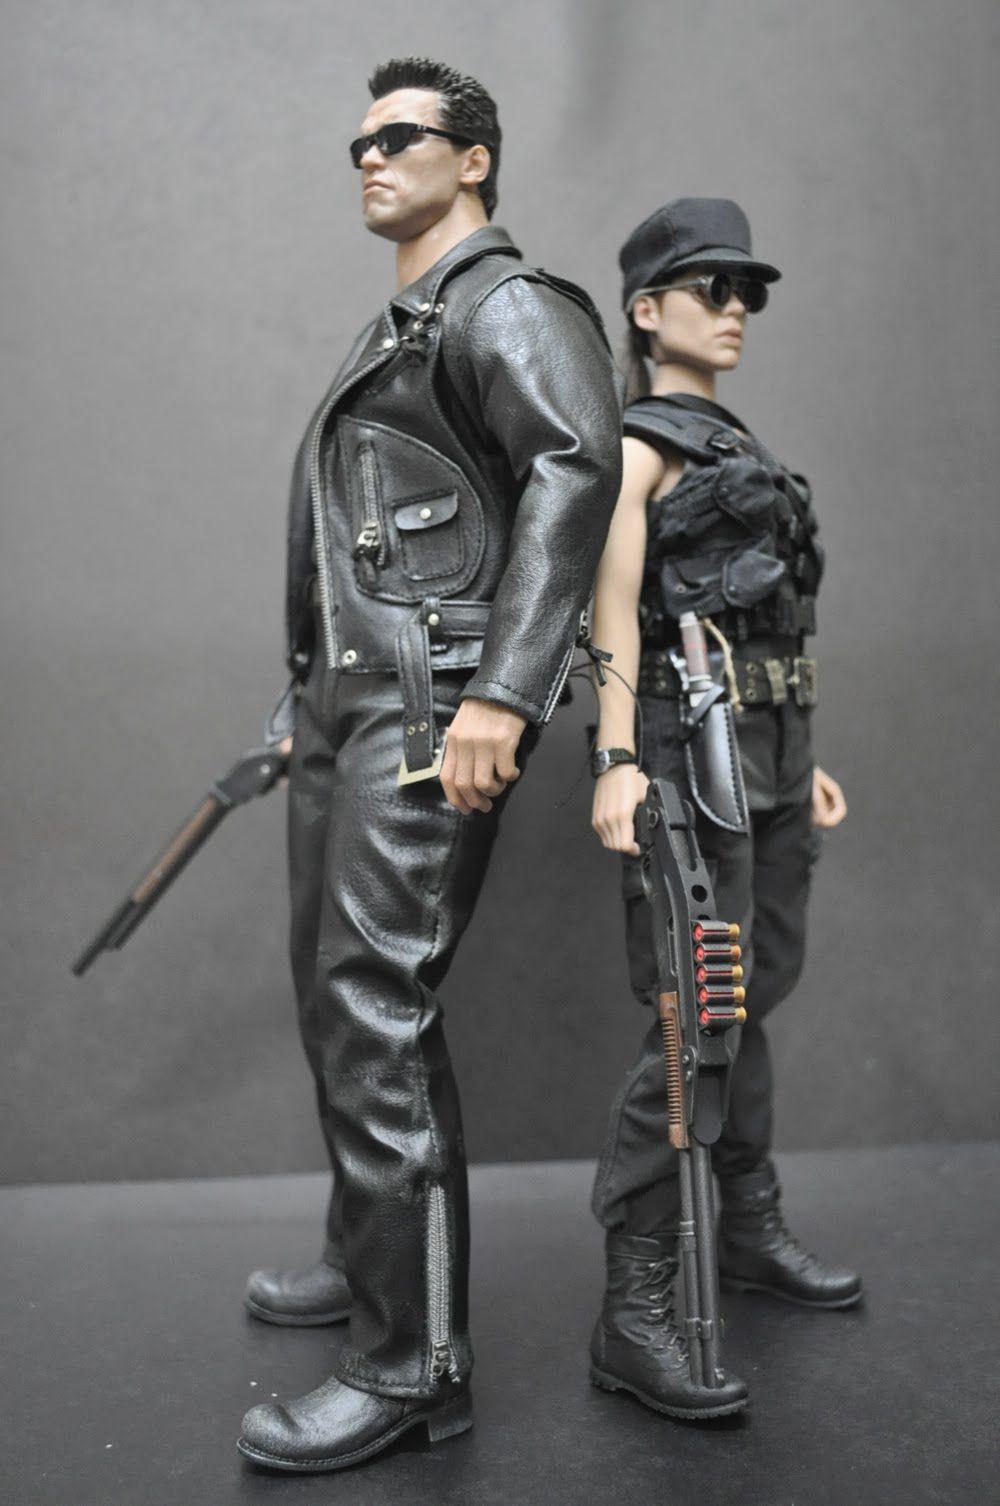 Terminator u0026 Sarah Connor  sc 1 st  Pinterest & Terminator u0026 Sarah Connor | Capturing the Character | Pinterest | Movie